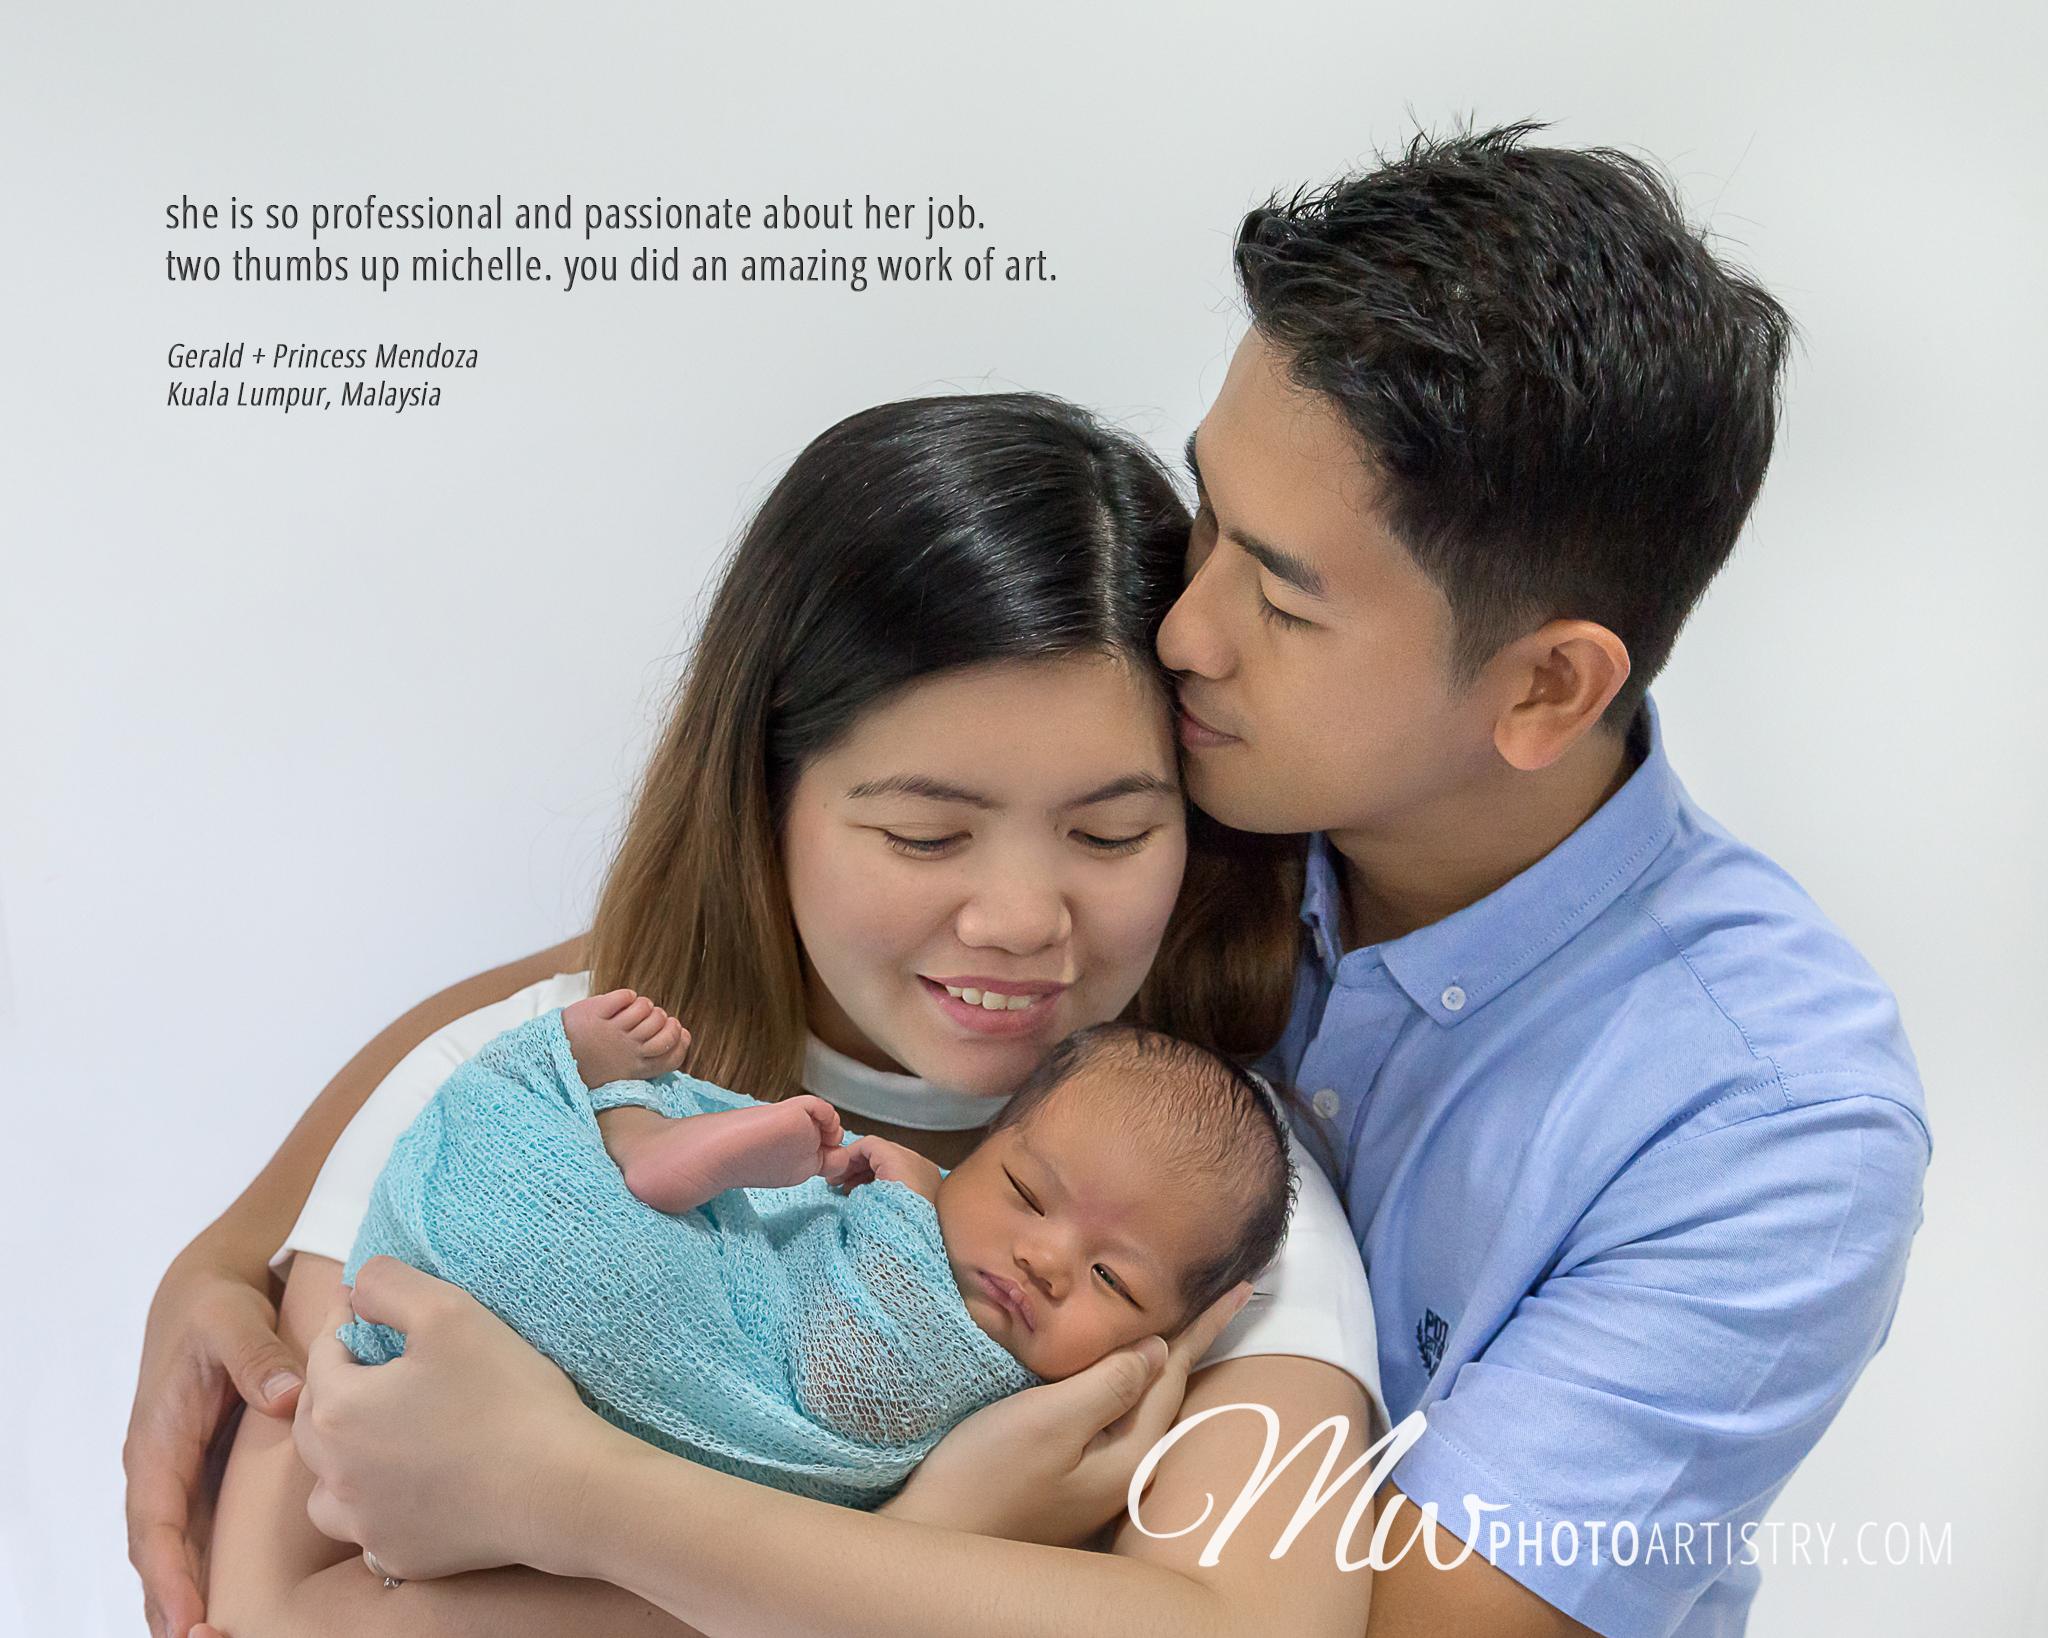 Malaysia Kuala Lumpur Kuching Newborn Baby Photographer Testimonial Photo.jpg